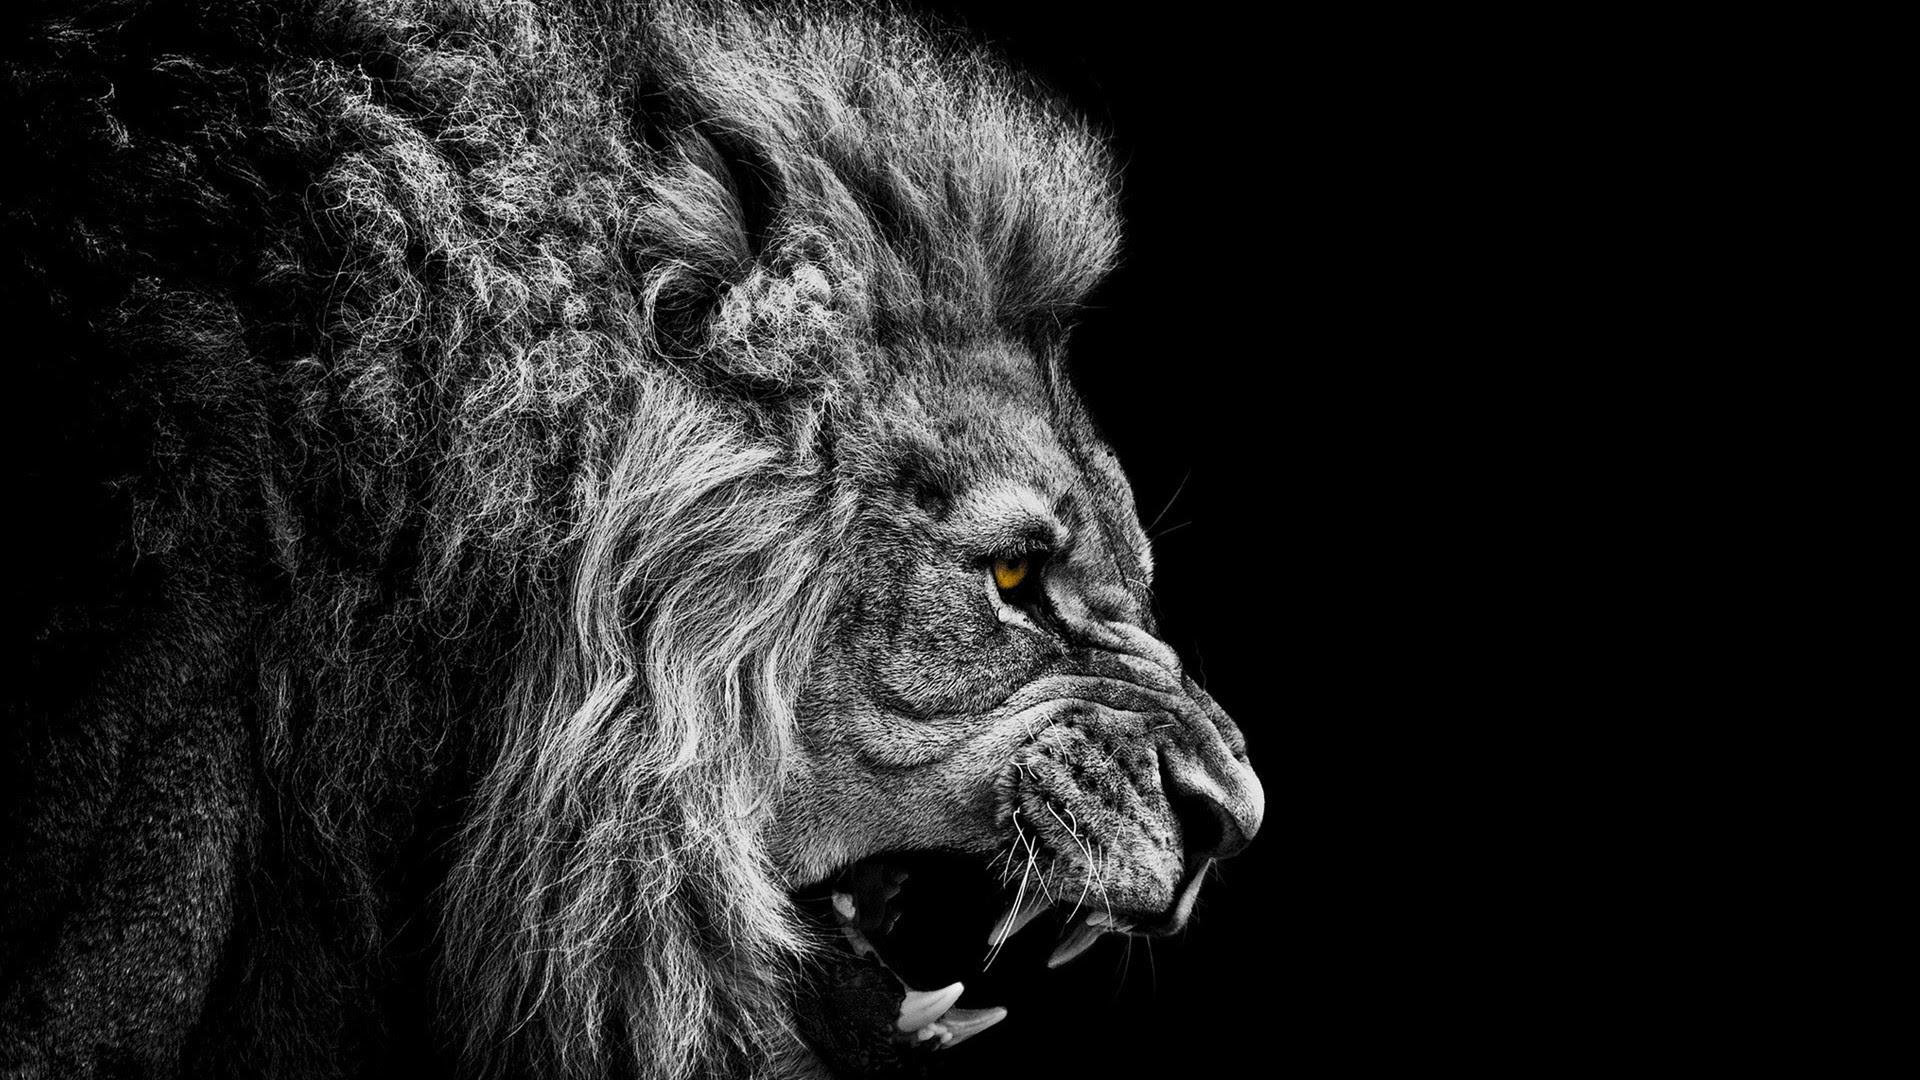 Download Wallpaper Lion Black And White Hd Cikimm Com